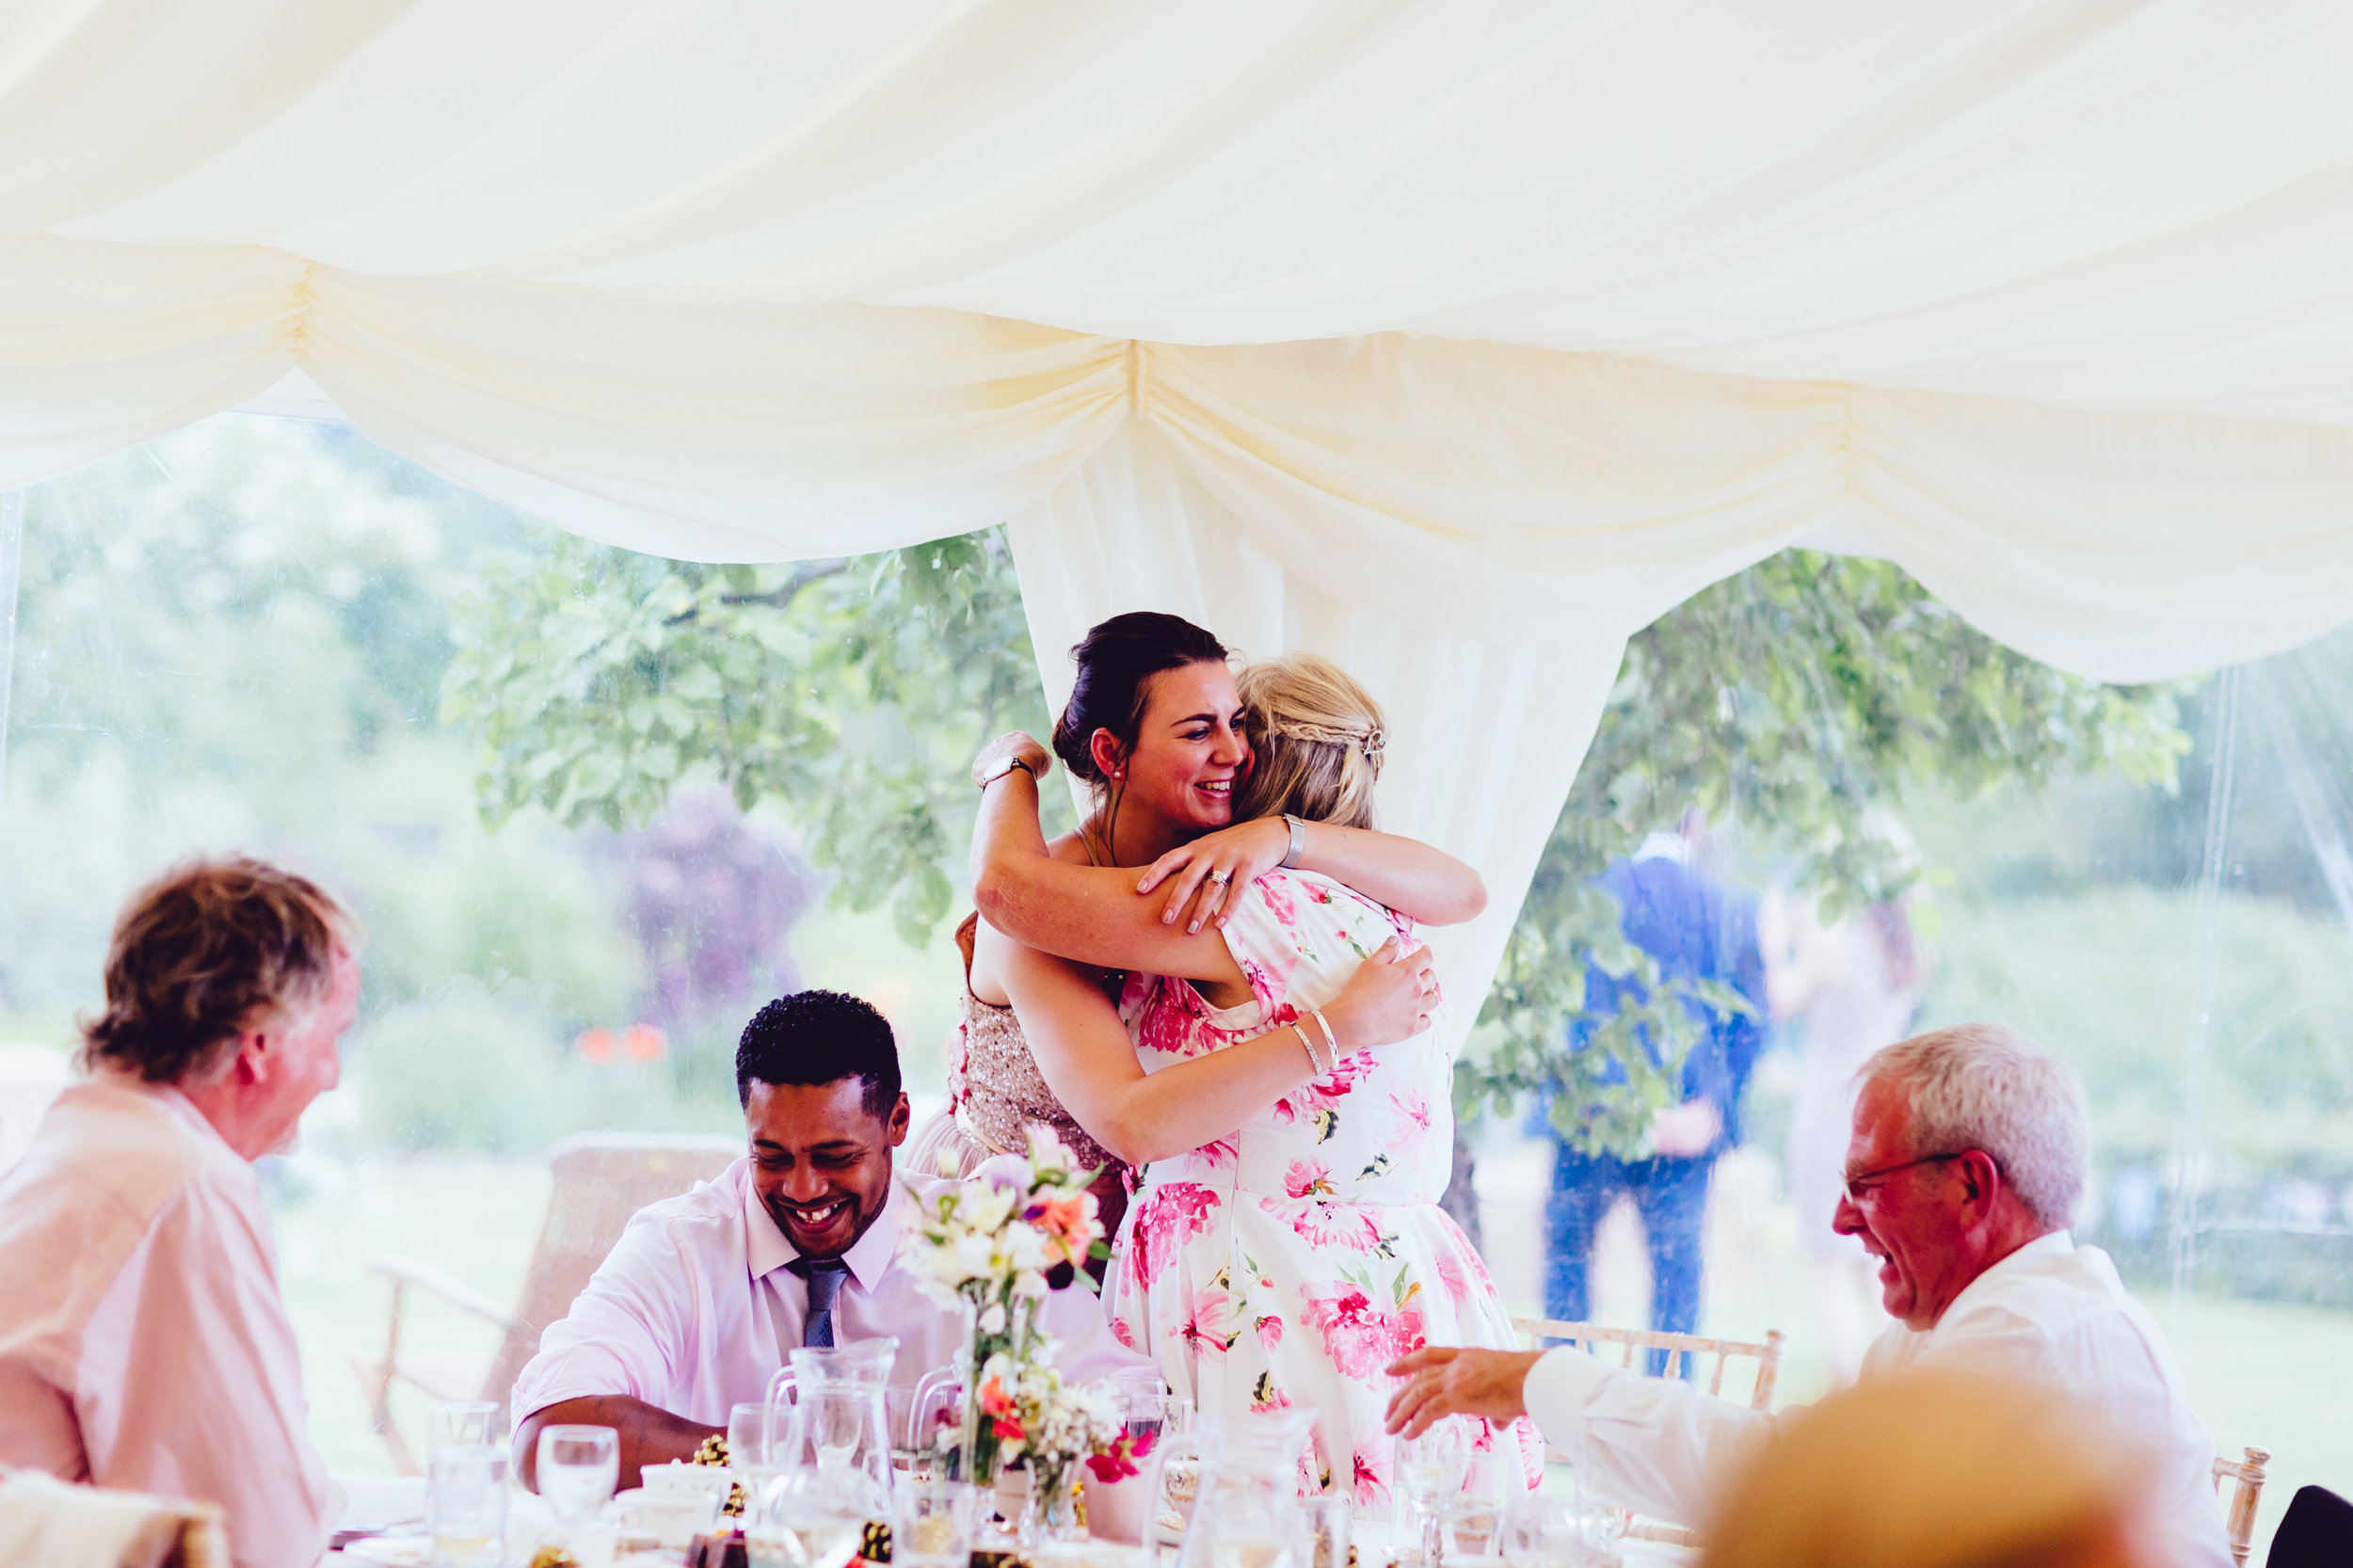 Birmingham photographer wedding country artistic wedding photography43.jpg